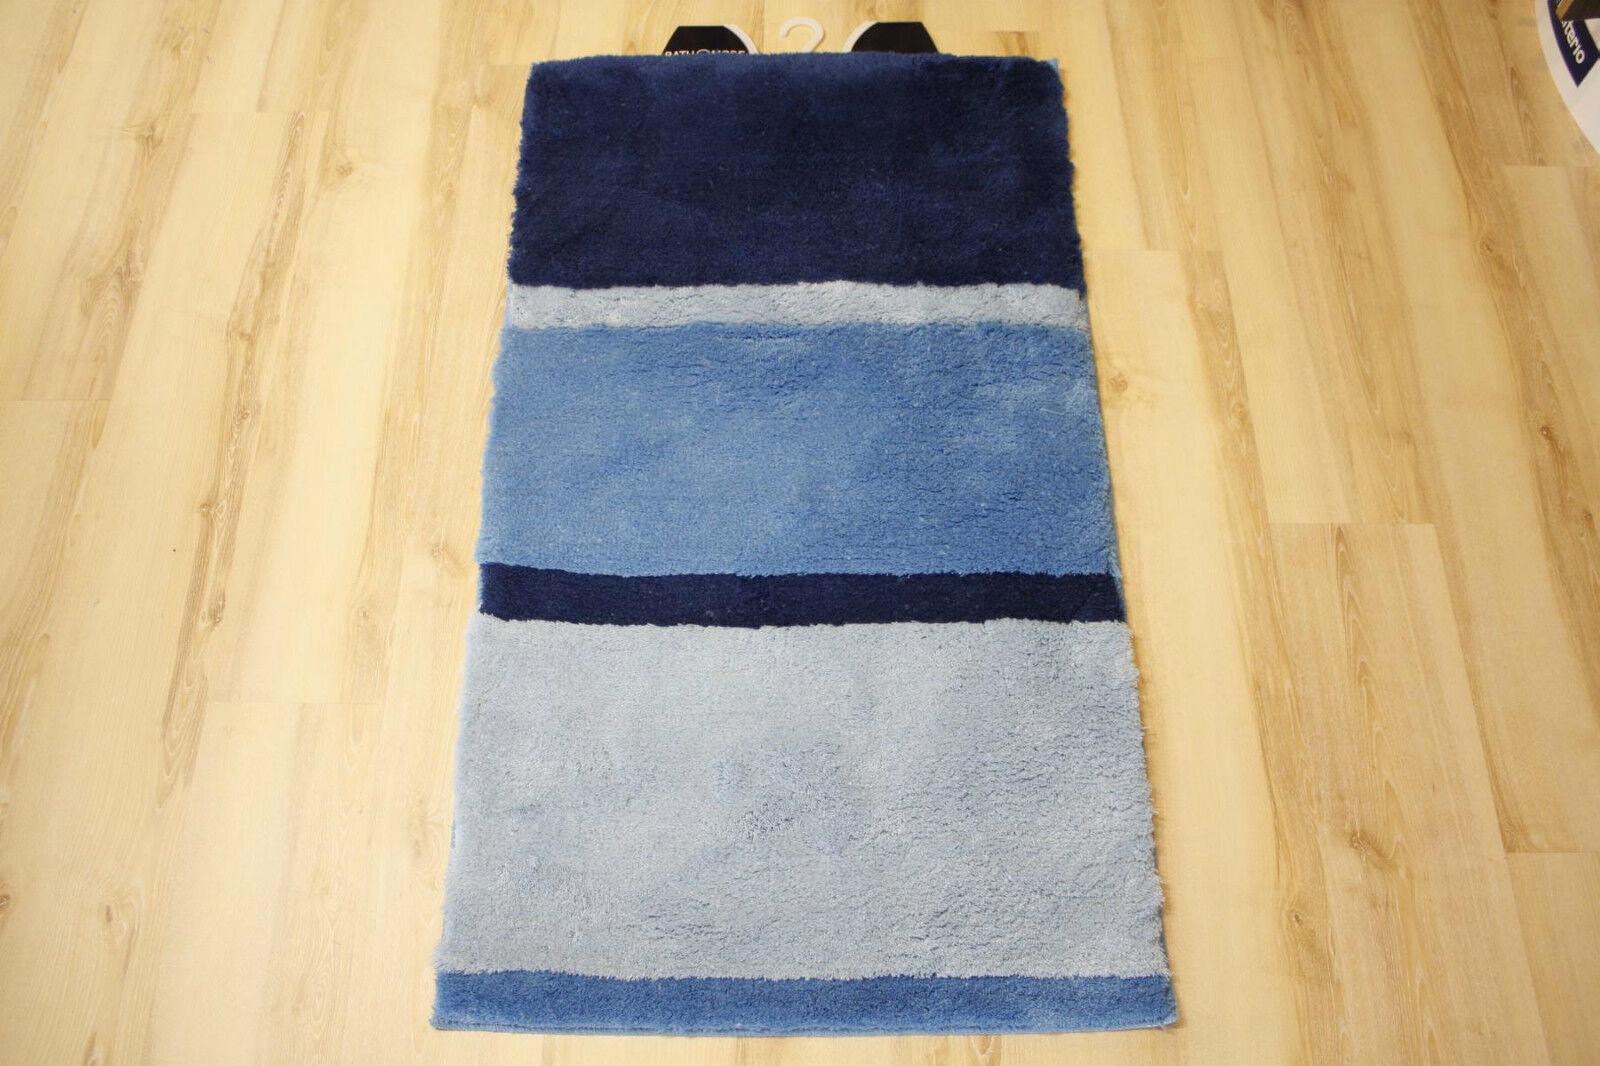 Badteppich Badematte Mali Blau 80x150 cm